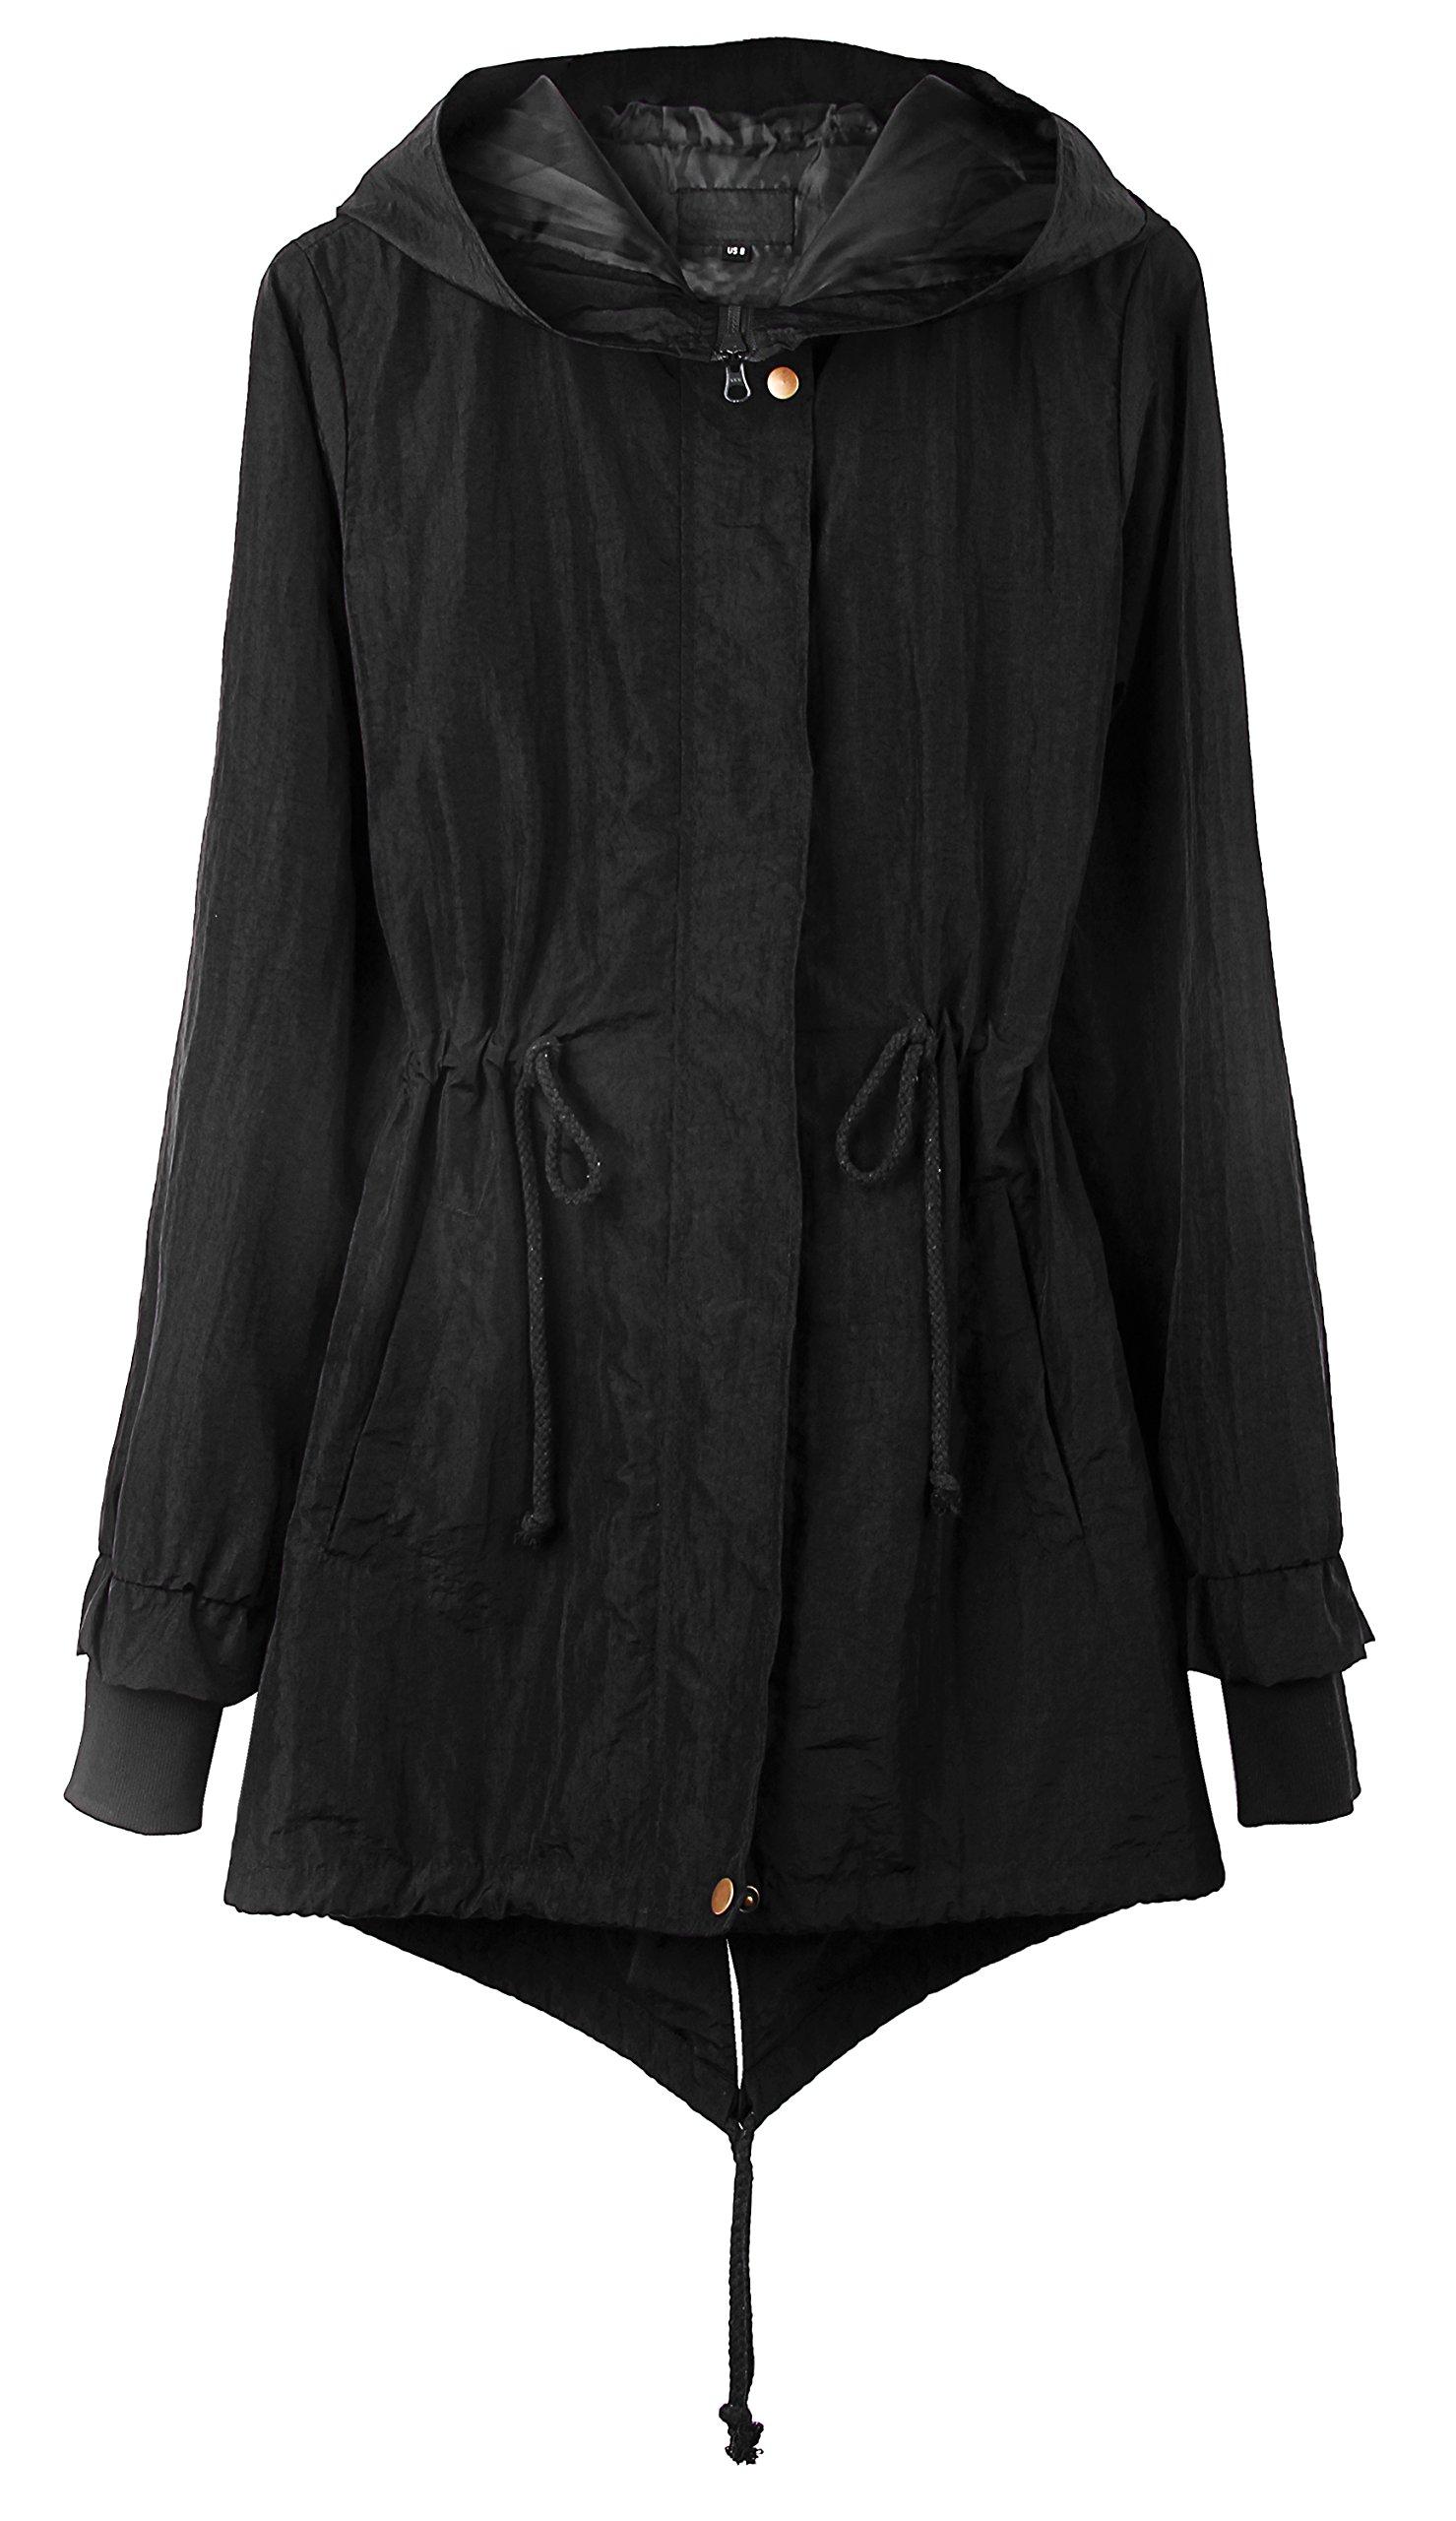 4HOW Women's Rain Coat with Hood Waterproof Long Military Anorak Jacket Black Size 8